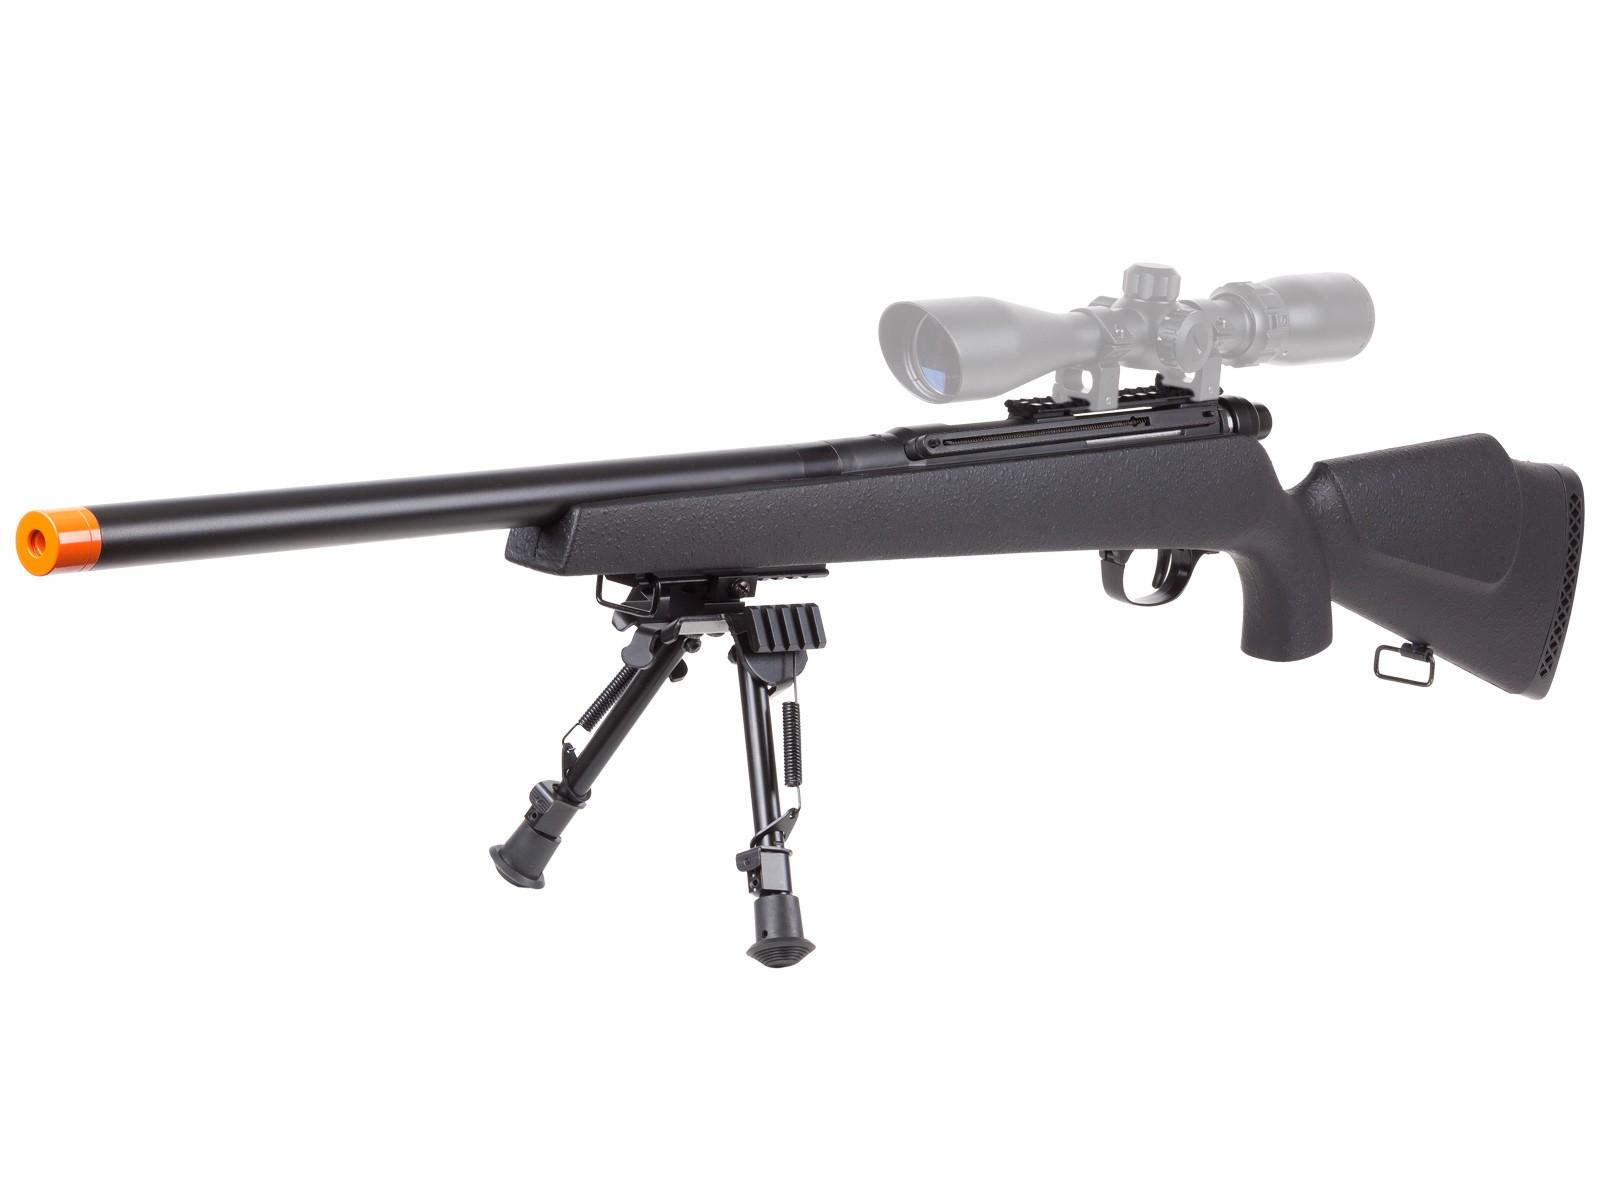 TSD_UHC_Super_X9_Double_Bolt_Airsoft_Rifle_Stick_Mag_6mm